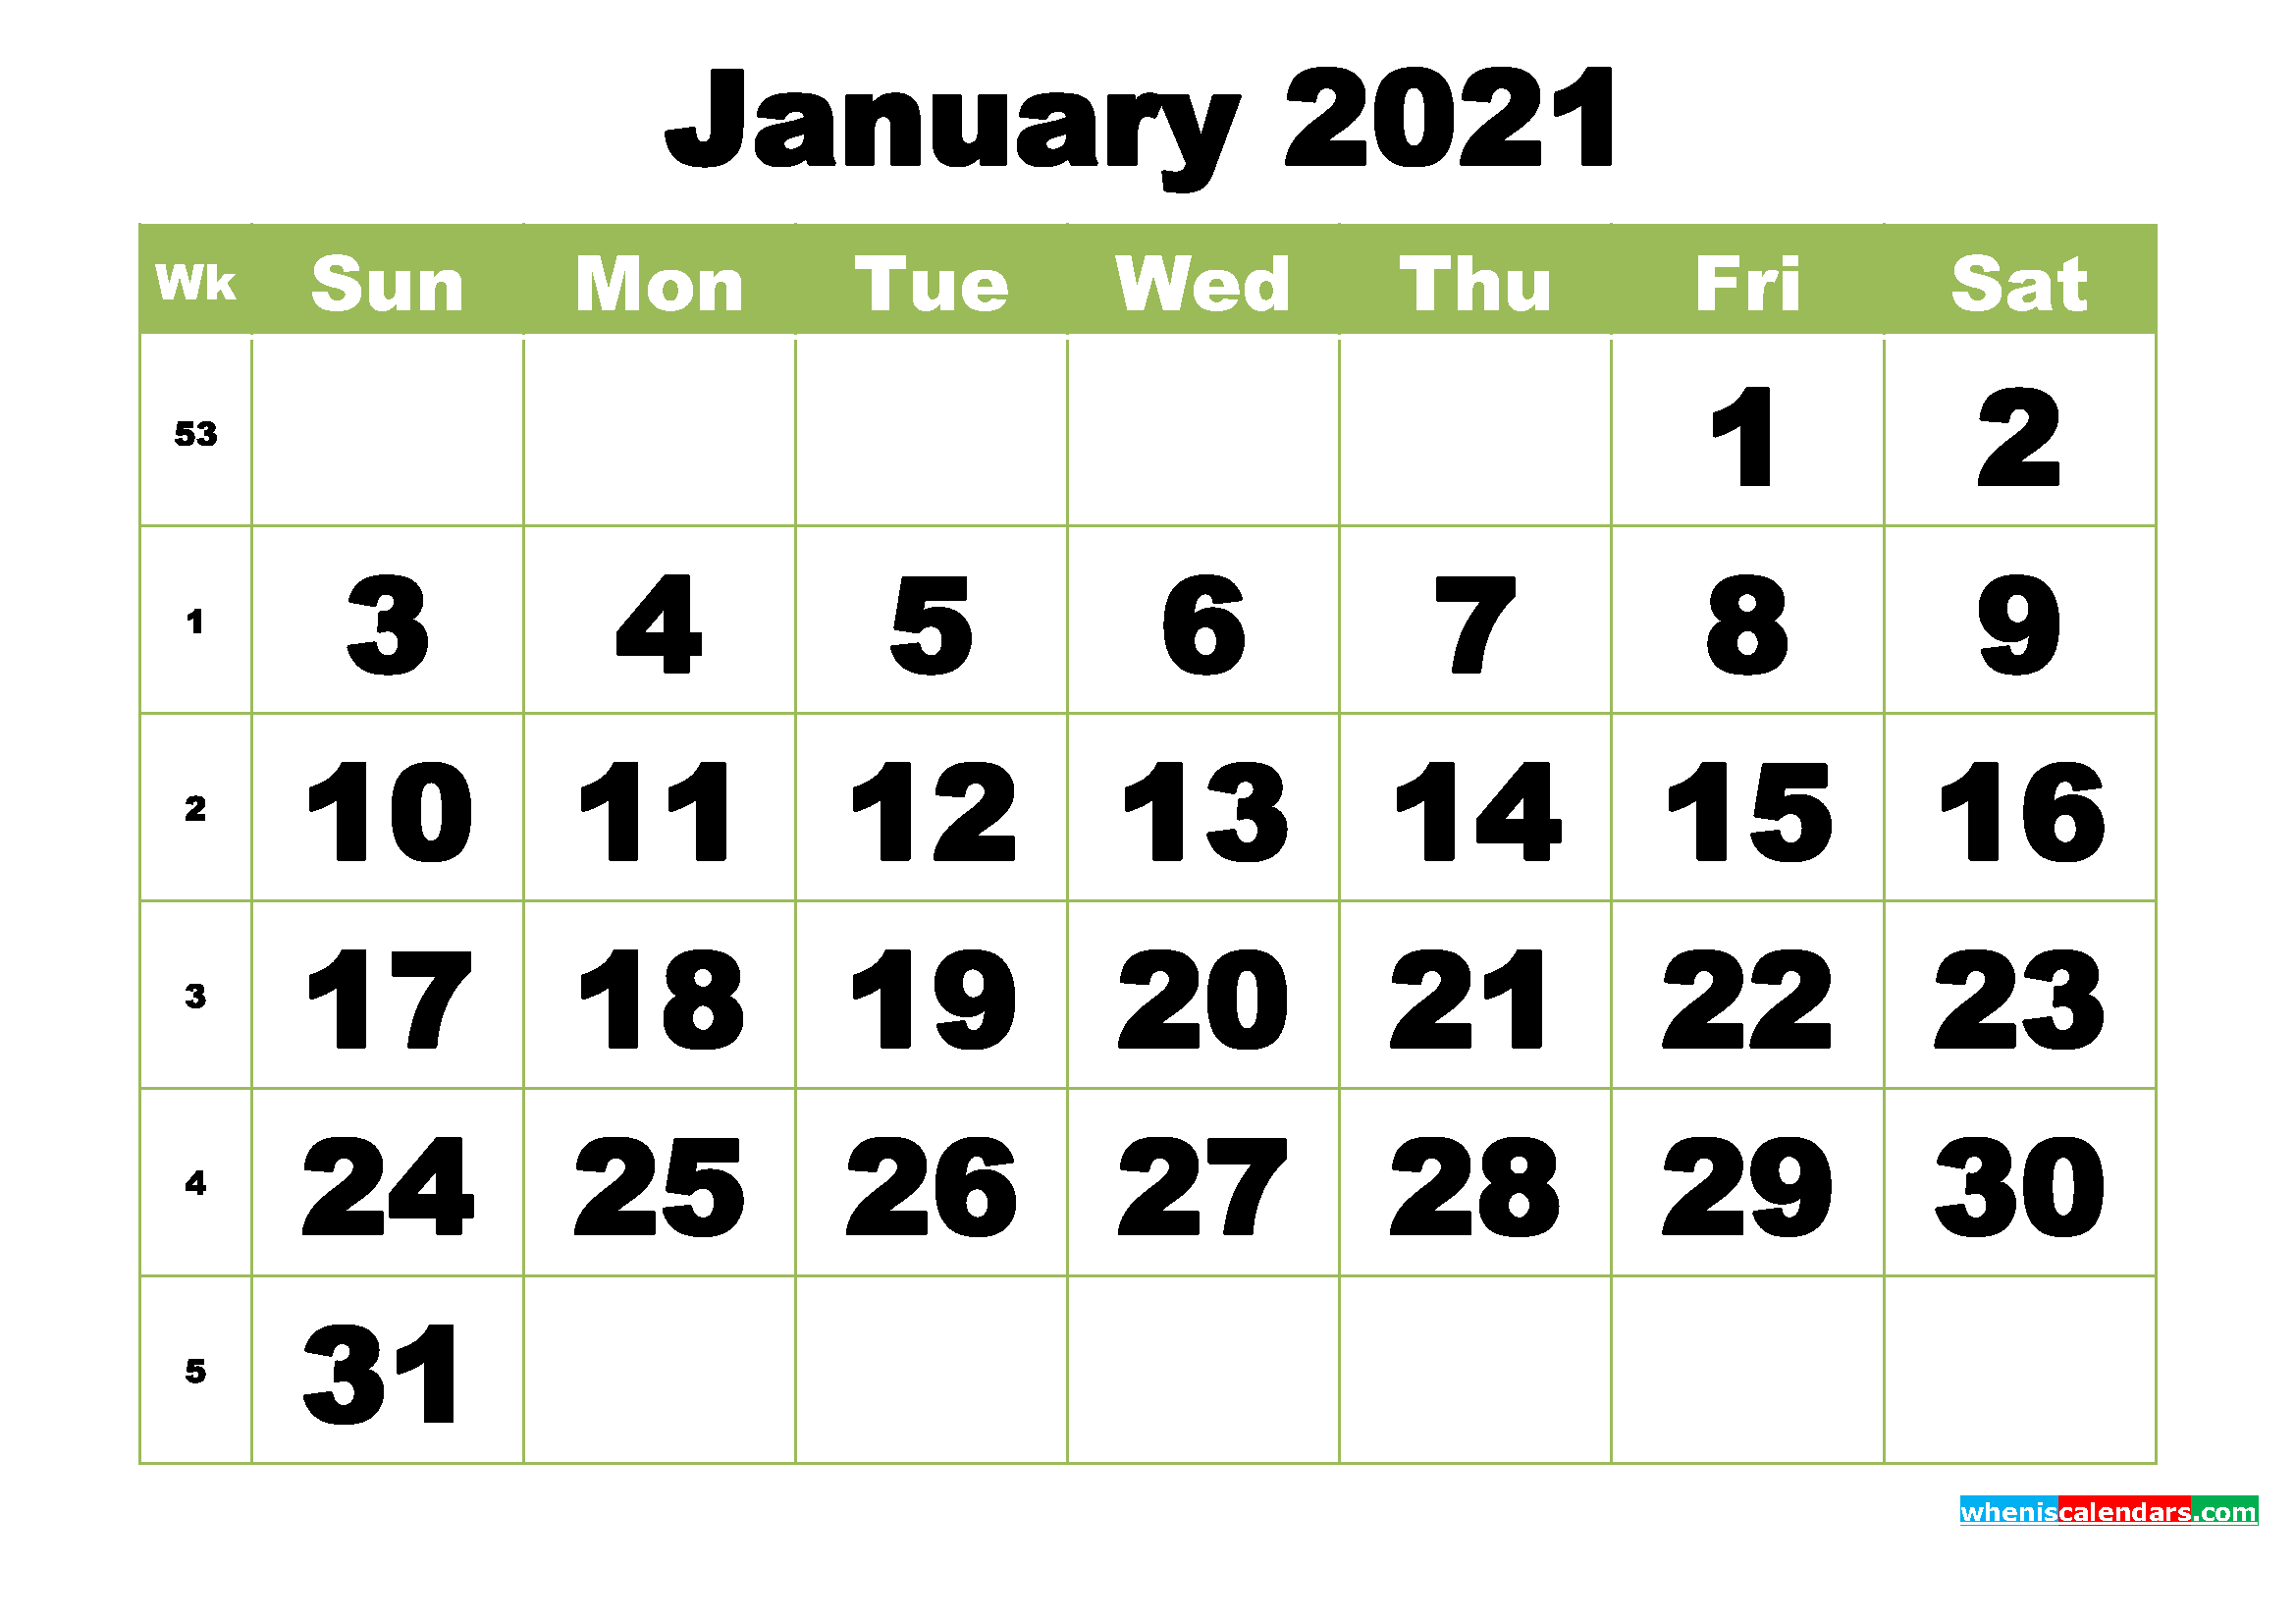 Free Printable Monthly Calendar January 2021 - Free ...